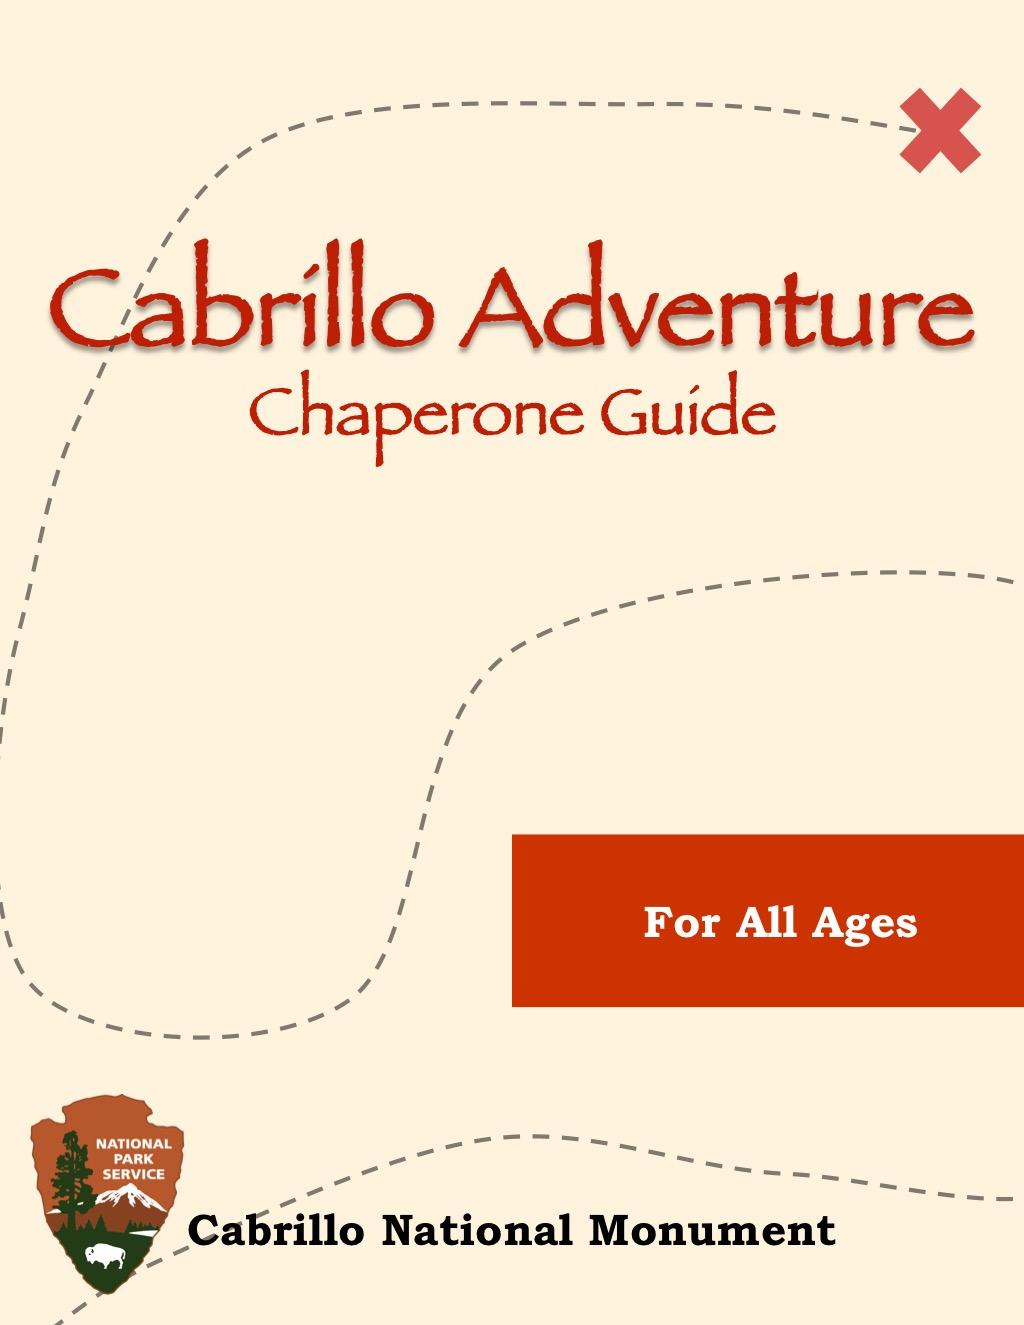 Chaperone Guide Cover.jpg